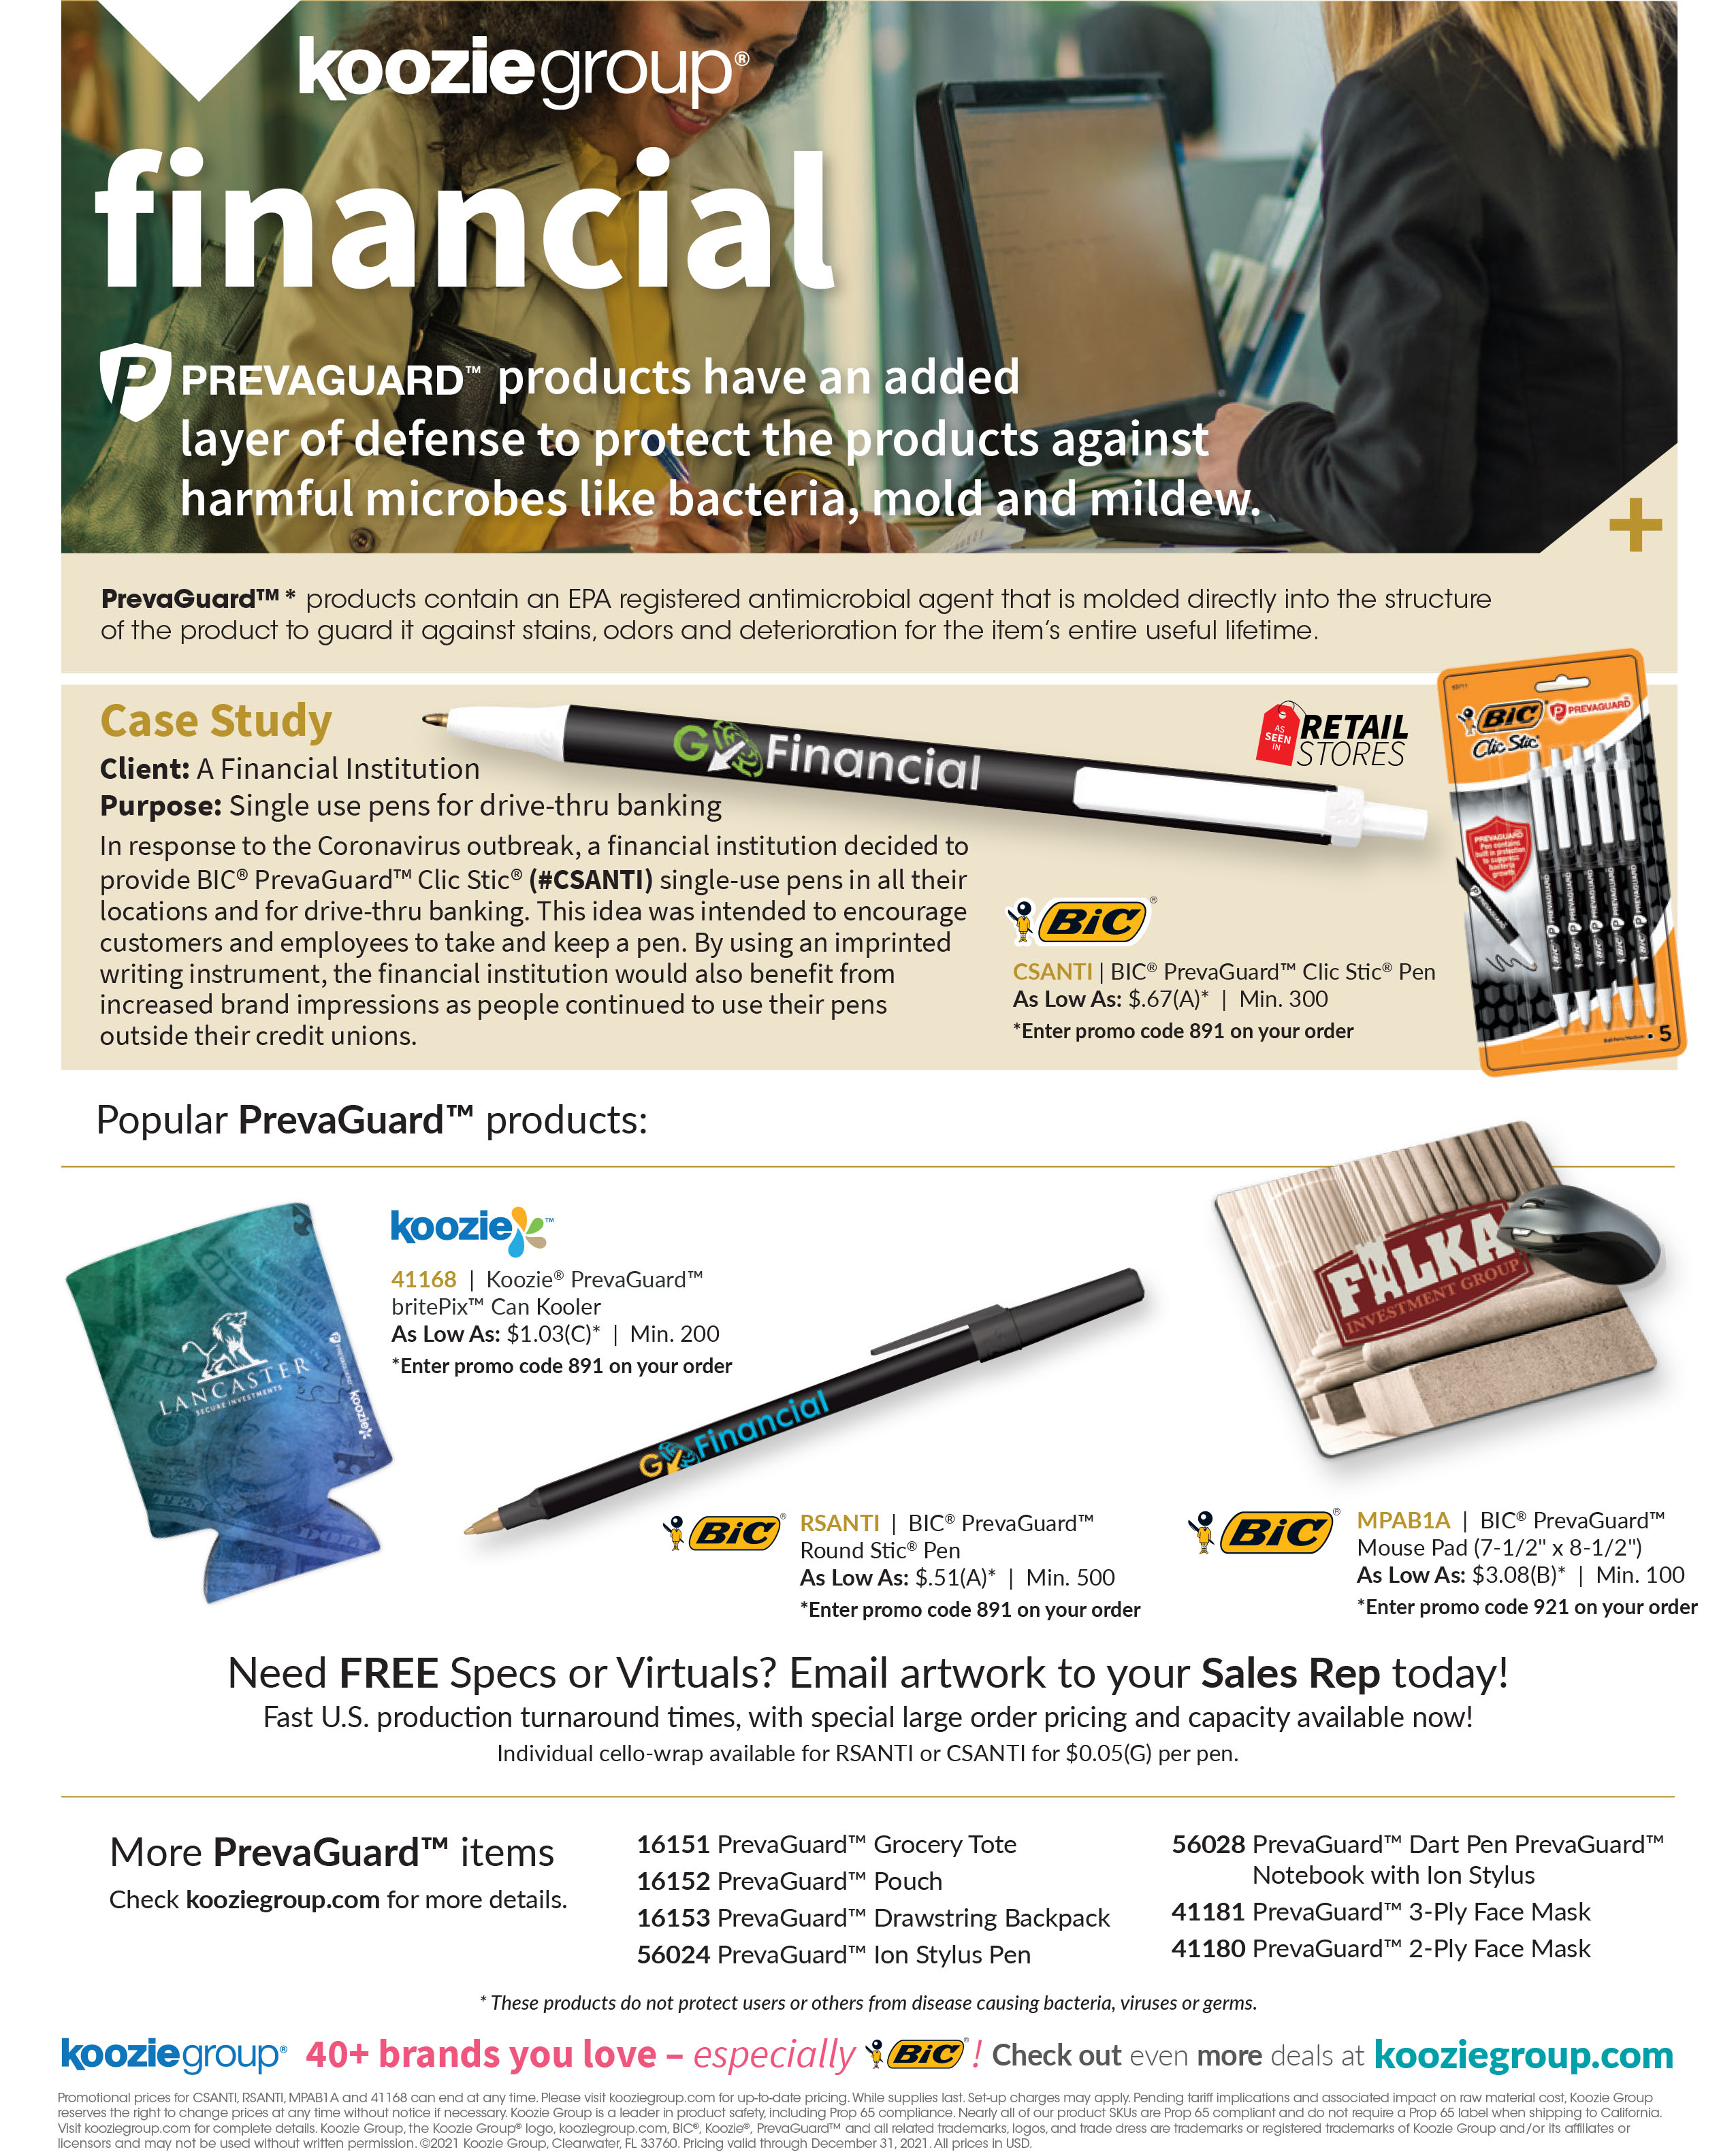 PrevaGuard Financial